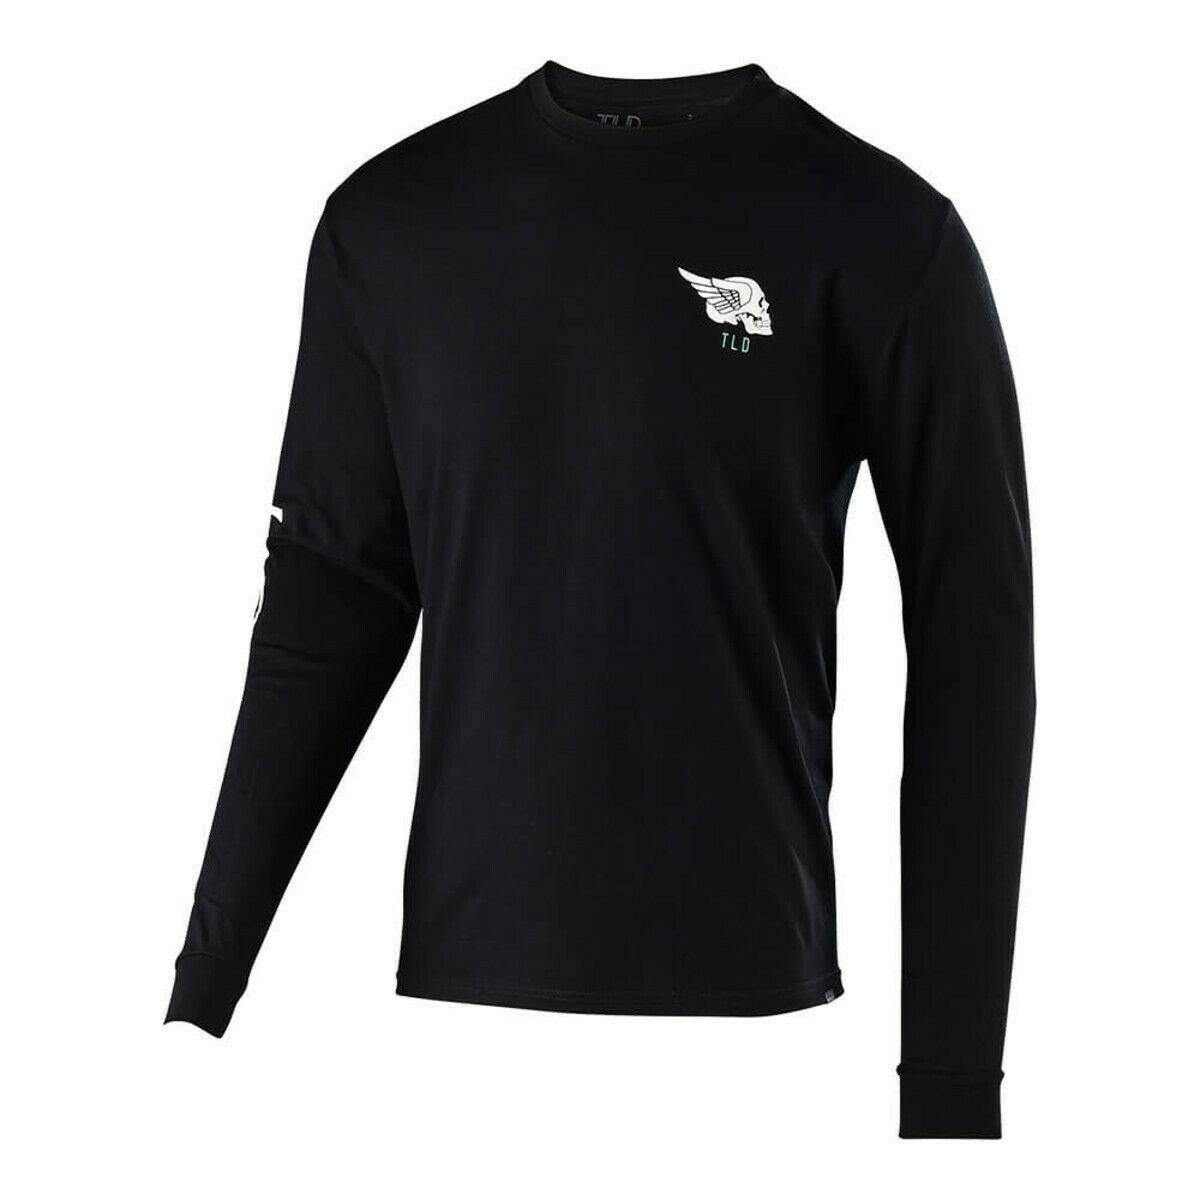 Troy Lee Designs Precision 2.0 Youth Short Sleeve T-Shirt Black